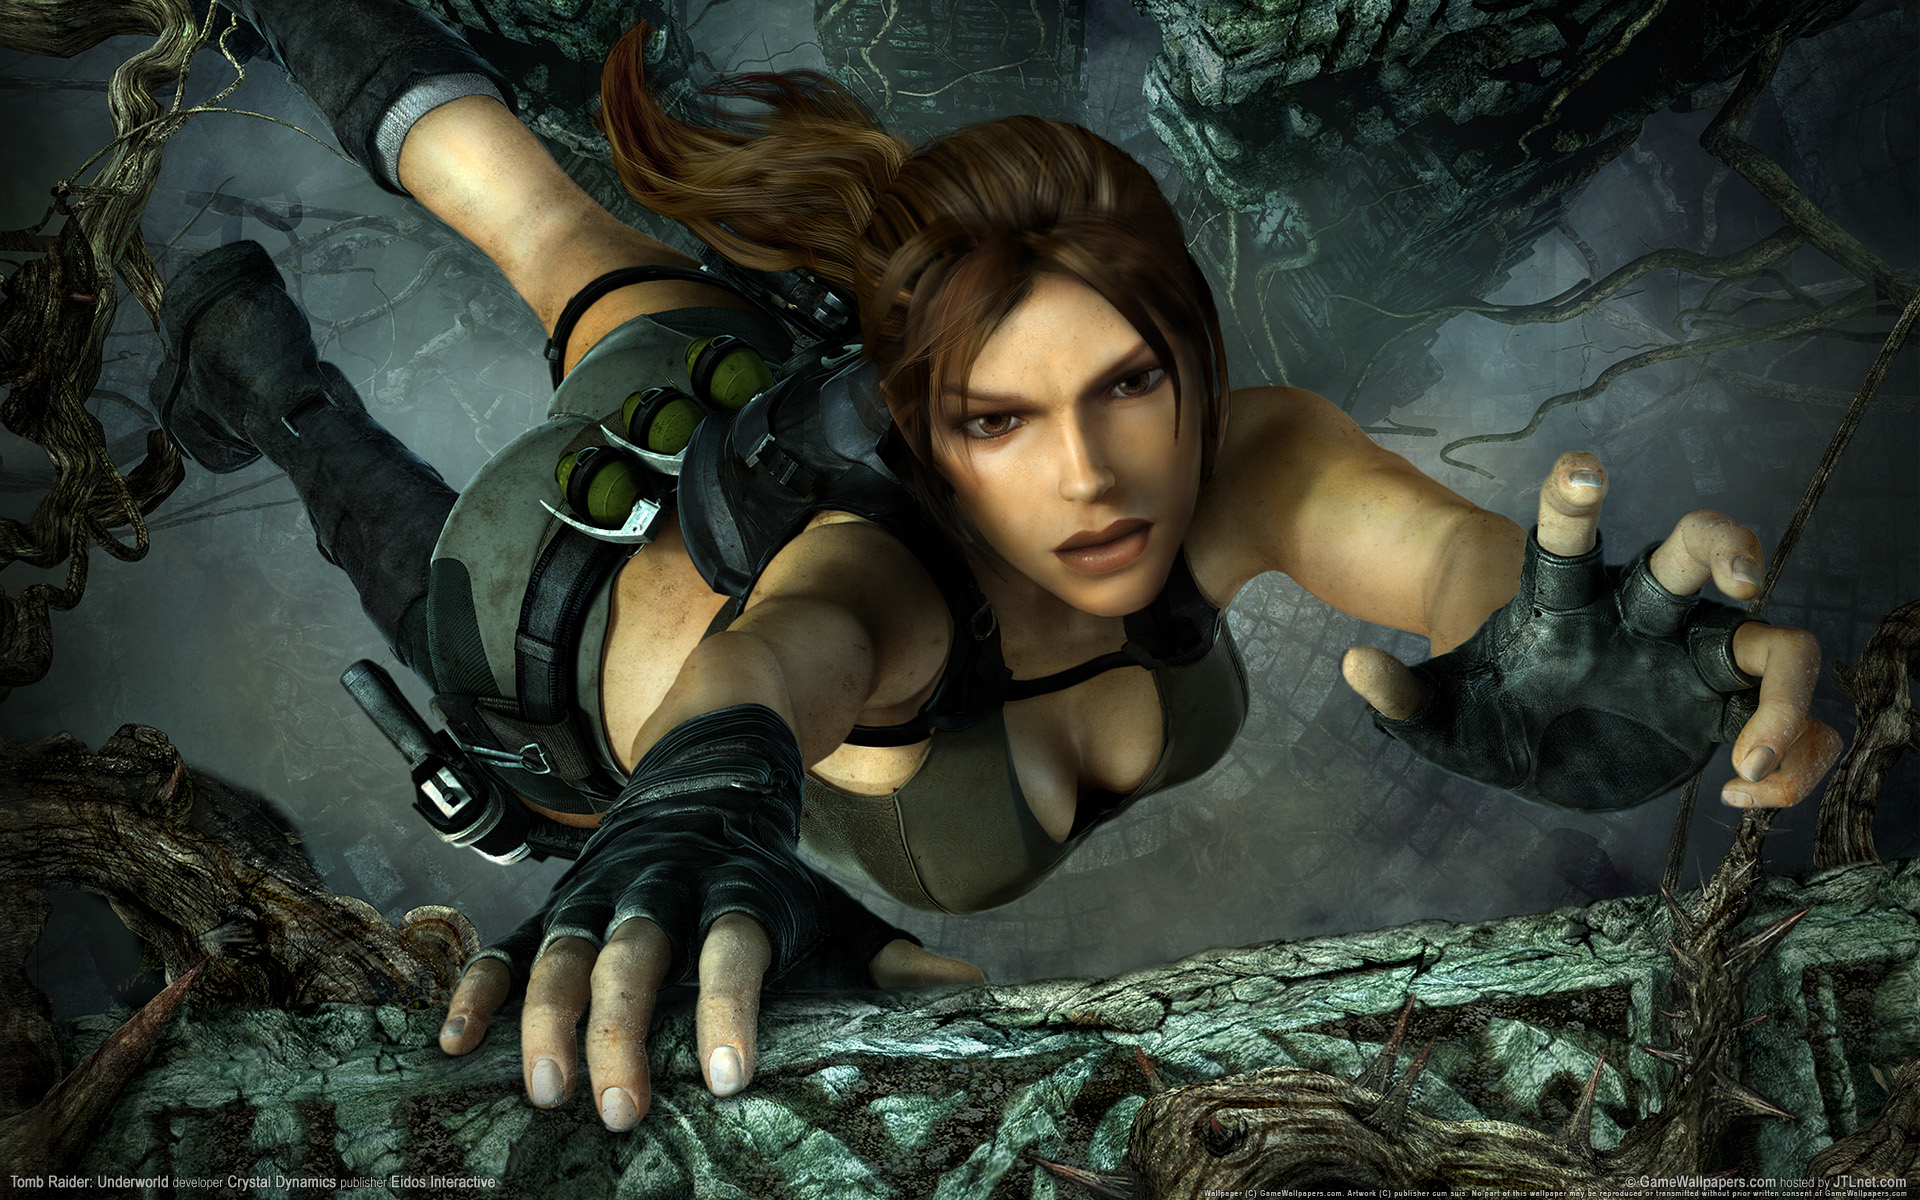 Tomb Raider Underworld Wallpaper - Lara Croft Tomb Raider Game Hot , HD Wallpaper & Backgrounds